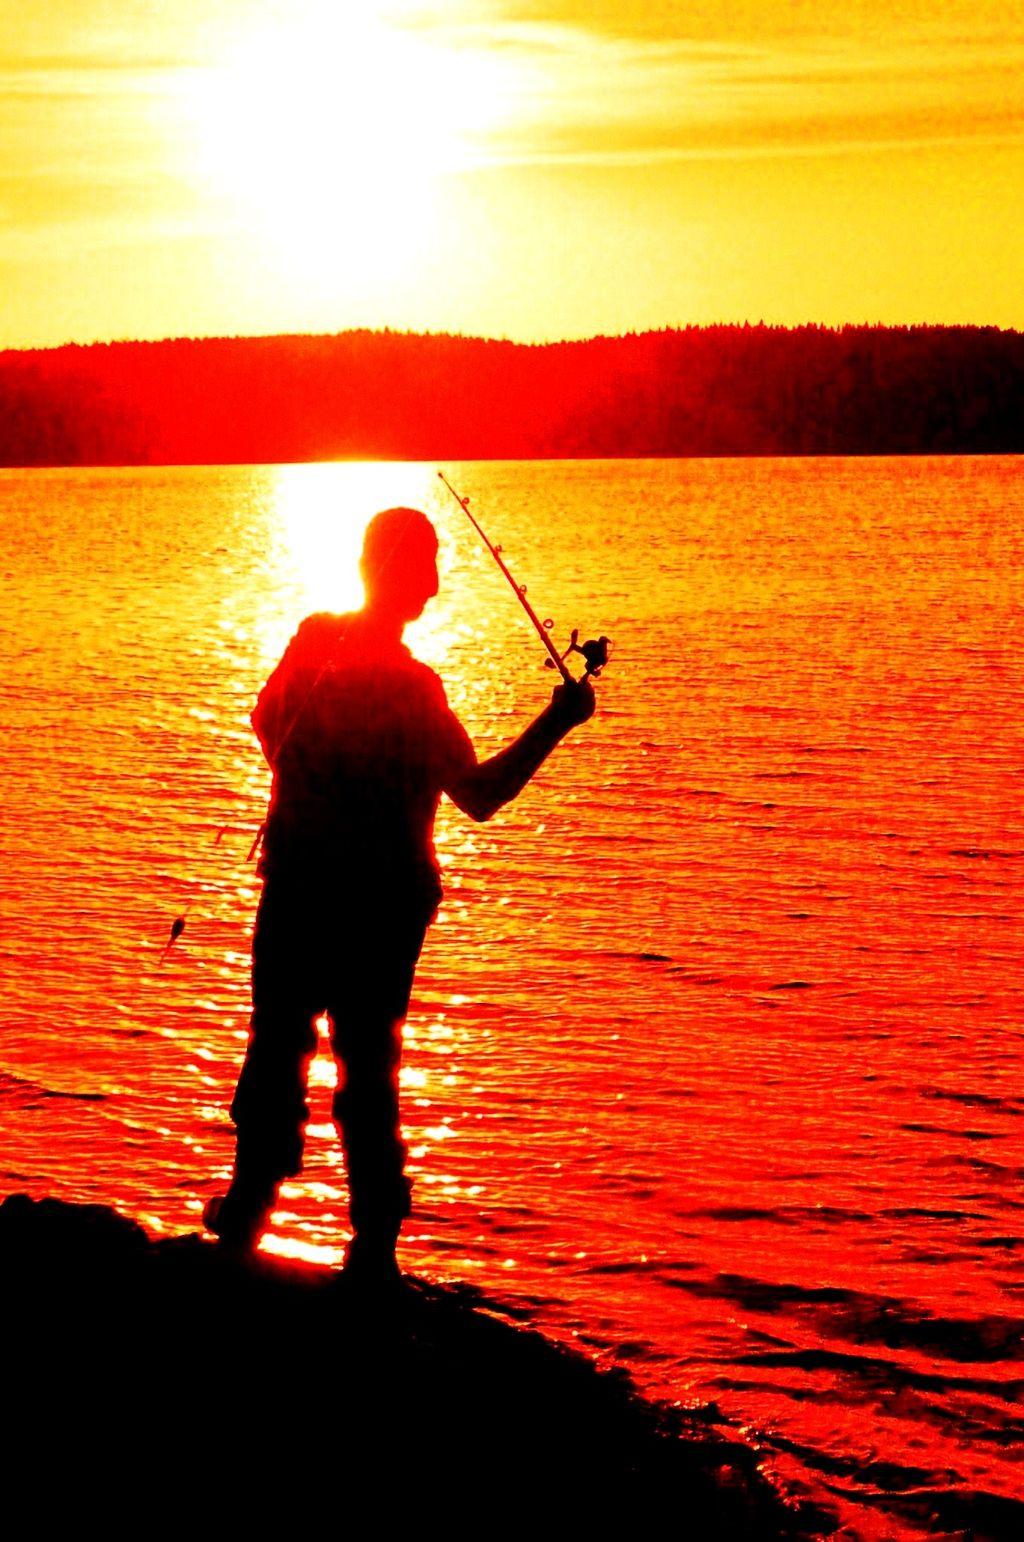 Название: рыбалка на закате.JPG Просмотров: 256  Размер: 253.8 Кб